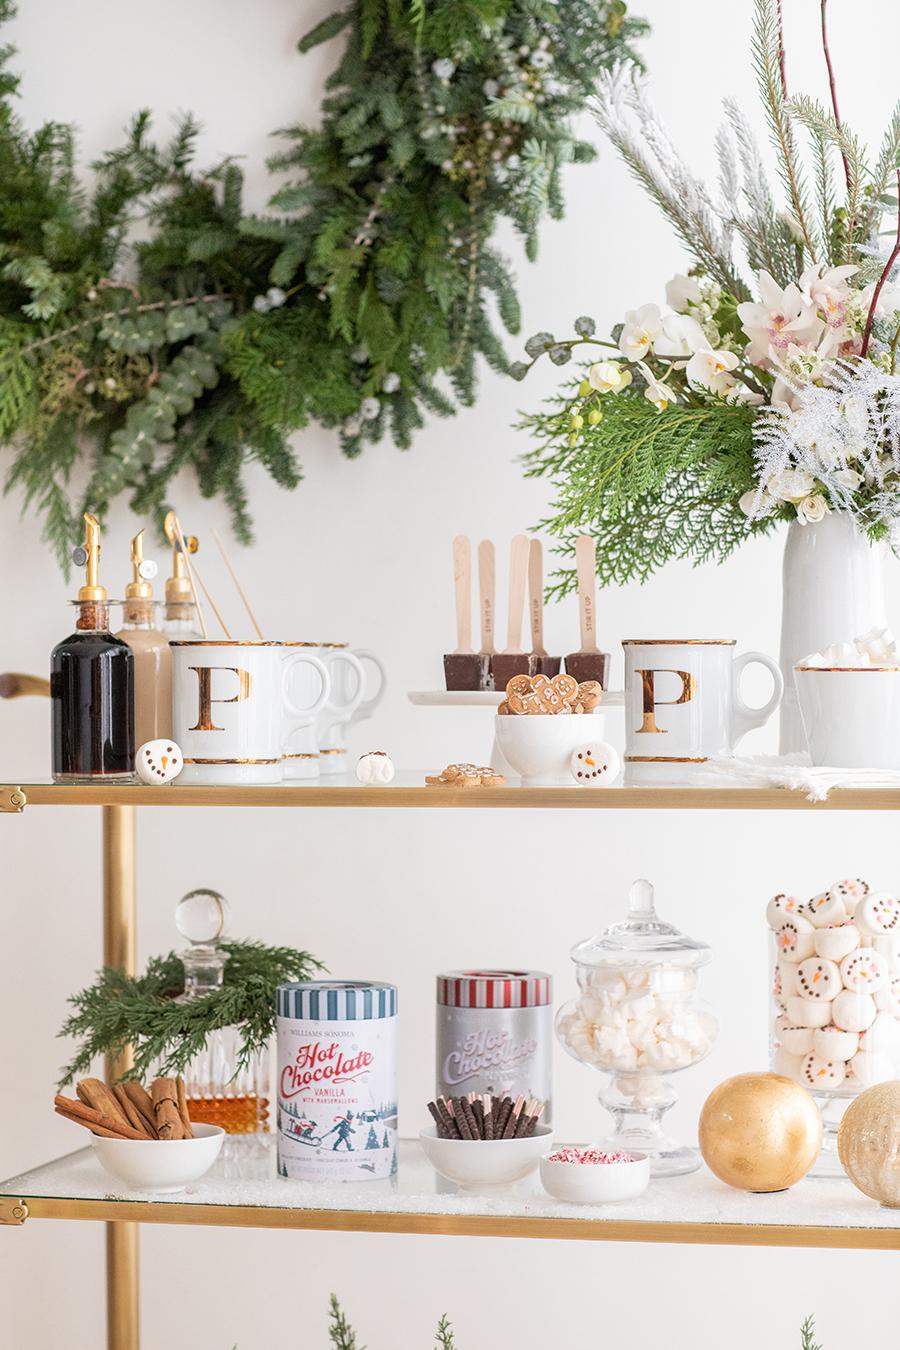 How to Create a Holiday Hot Chocolate Bar #hotchocolatebar